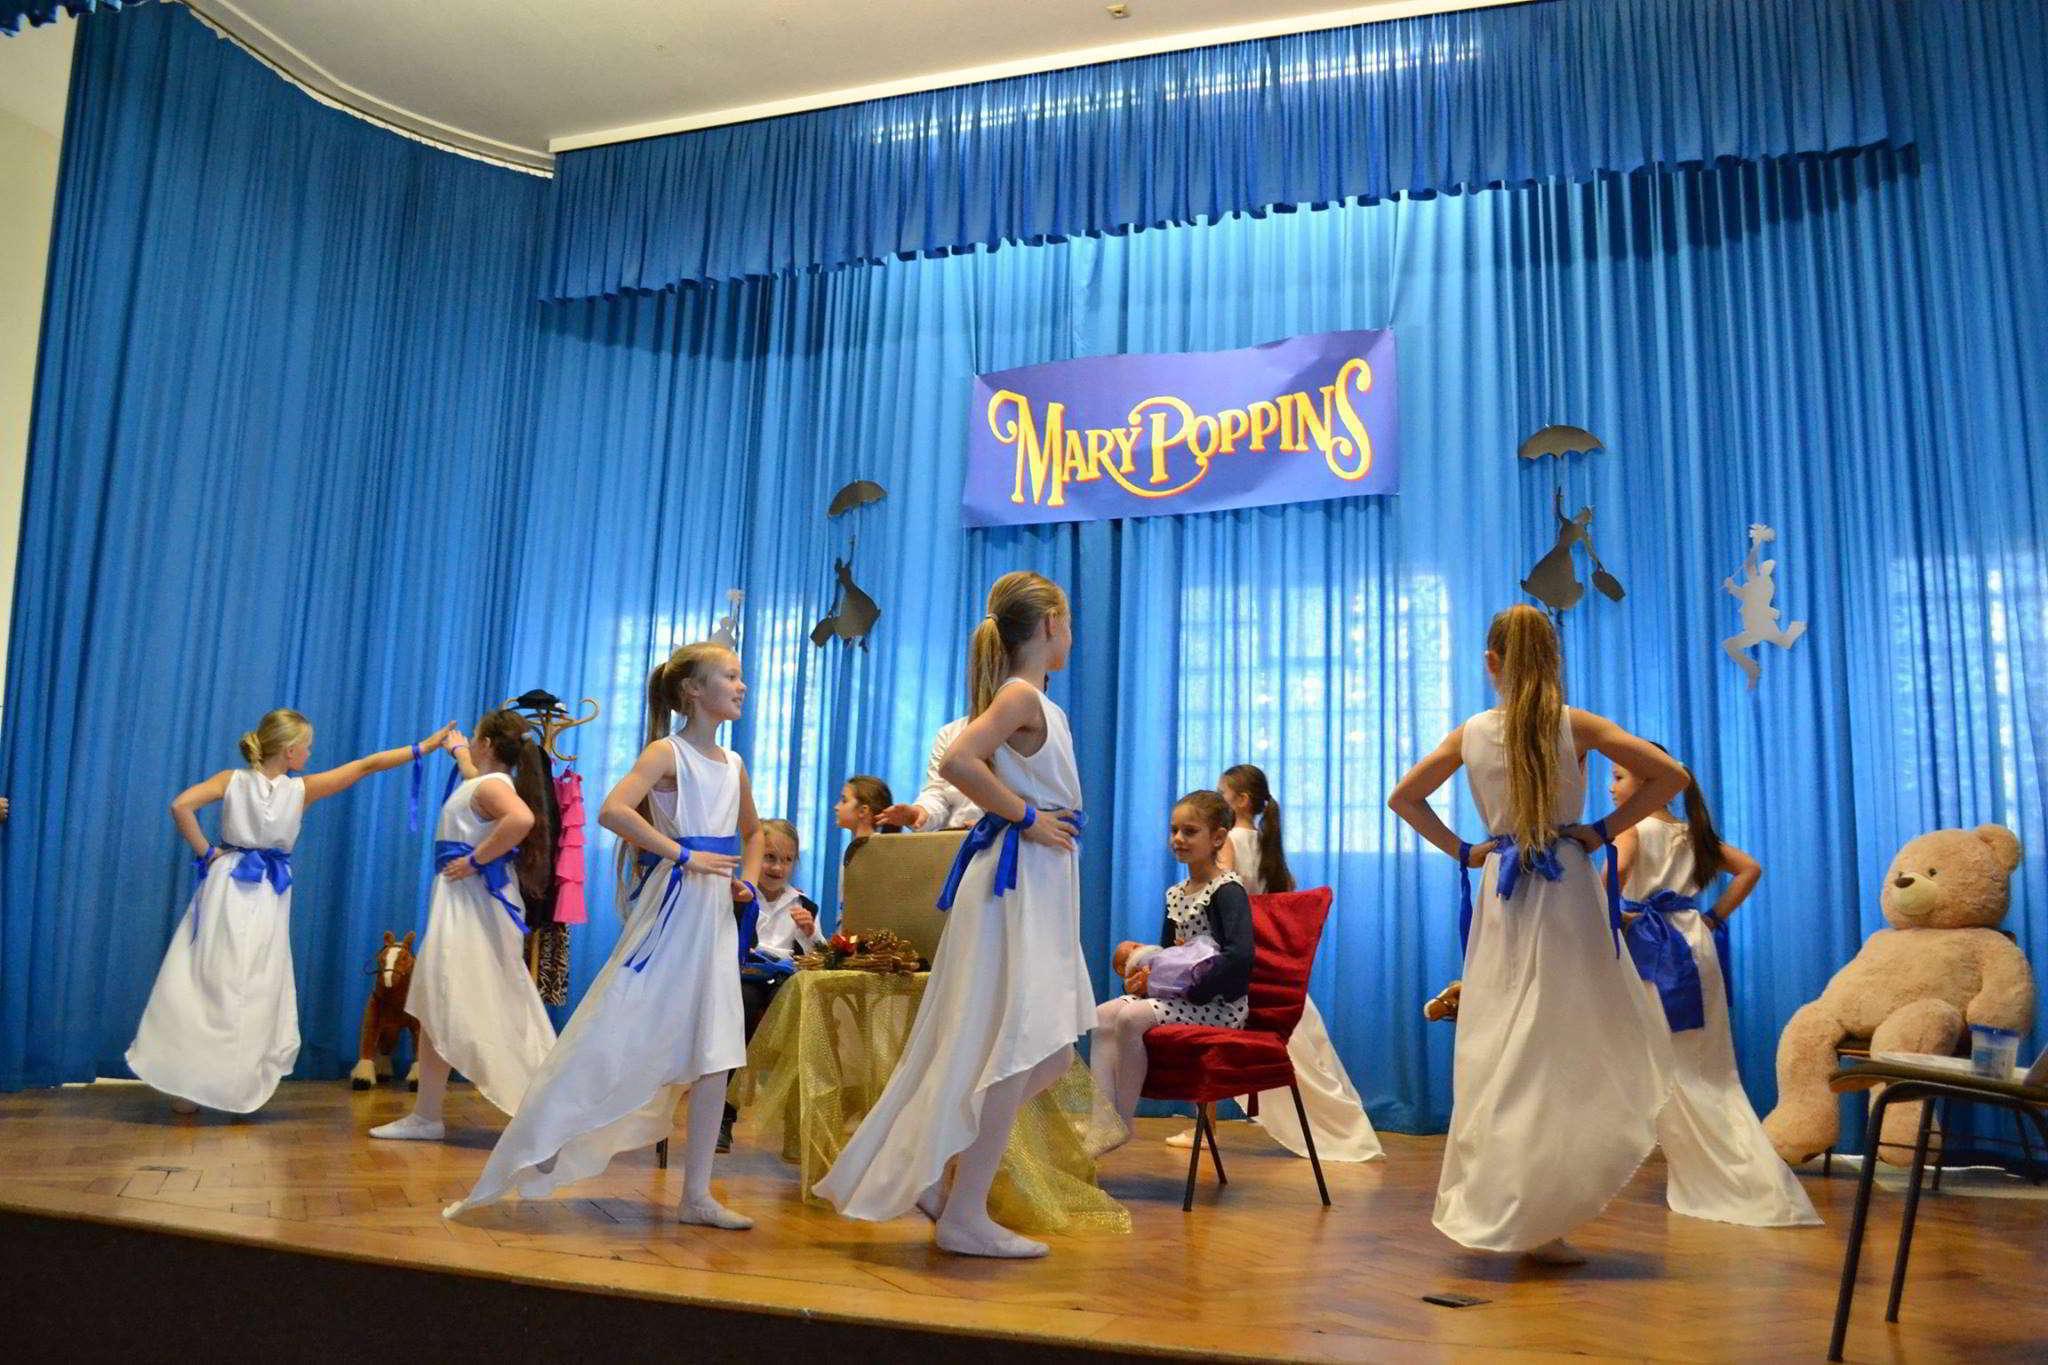 Ballettschule Letizia Costa - Mary Poppins